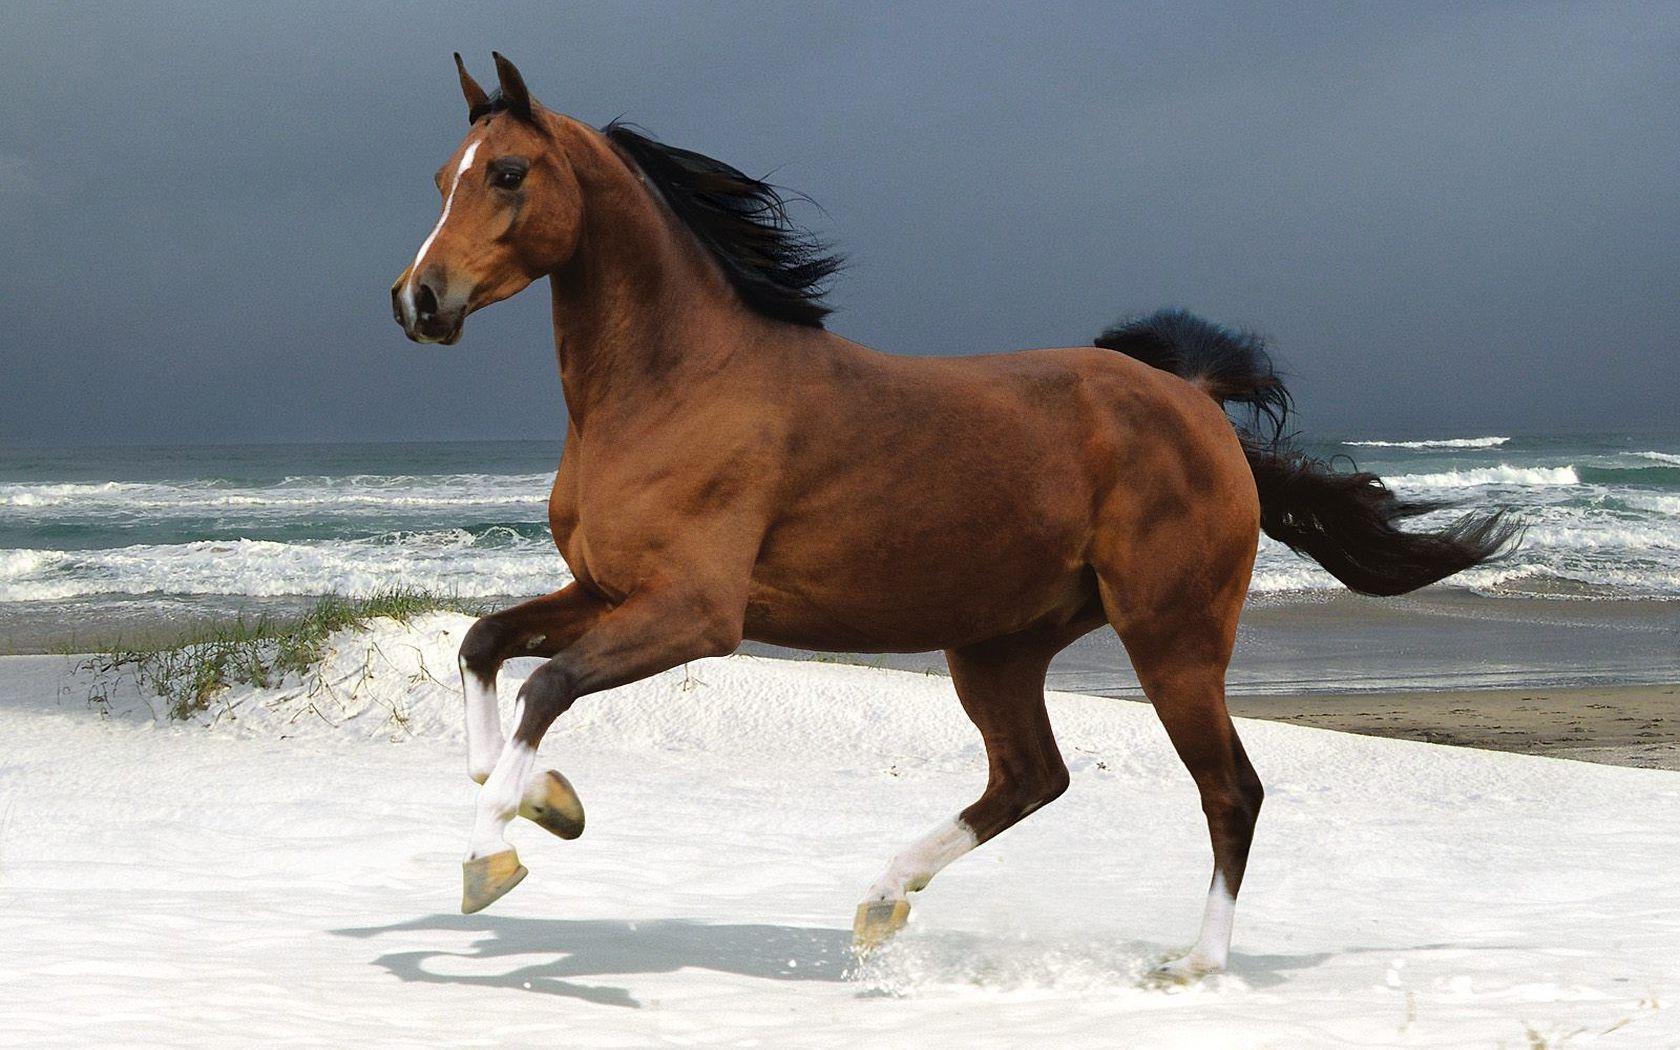 Must see Wallpaper Horse Pinterest - bf5d7b16586b2c34bb6bd28073f6d2c1  2018_883946.jpg